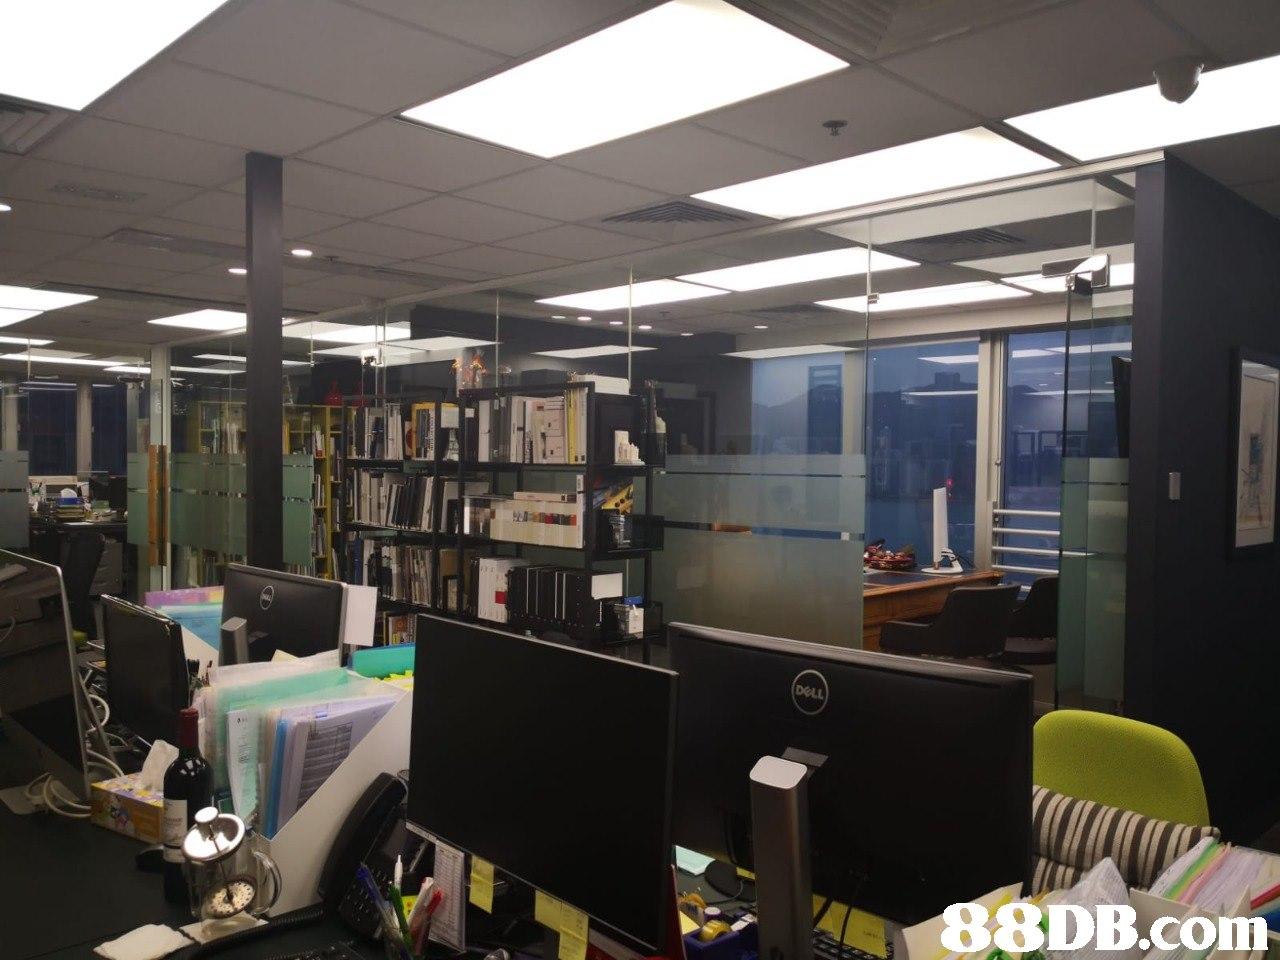 be 8DB.com  Building,Interior design,Room,Office,